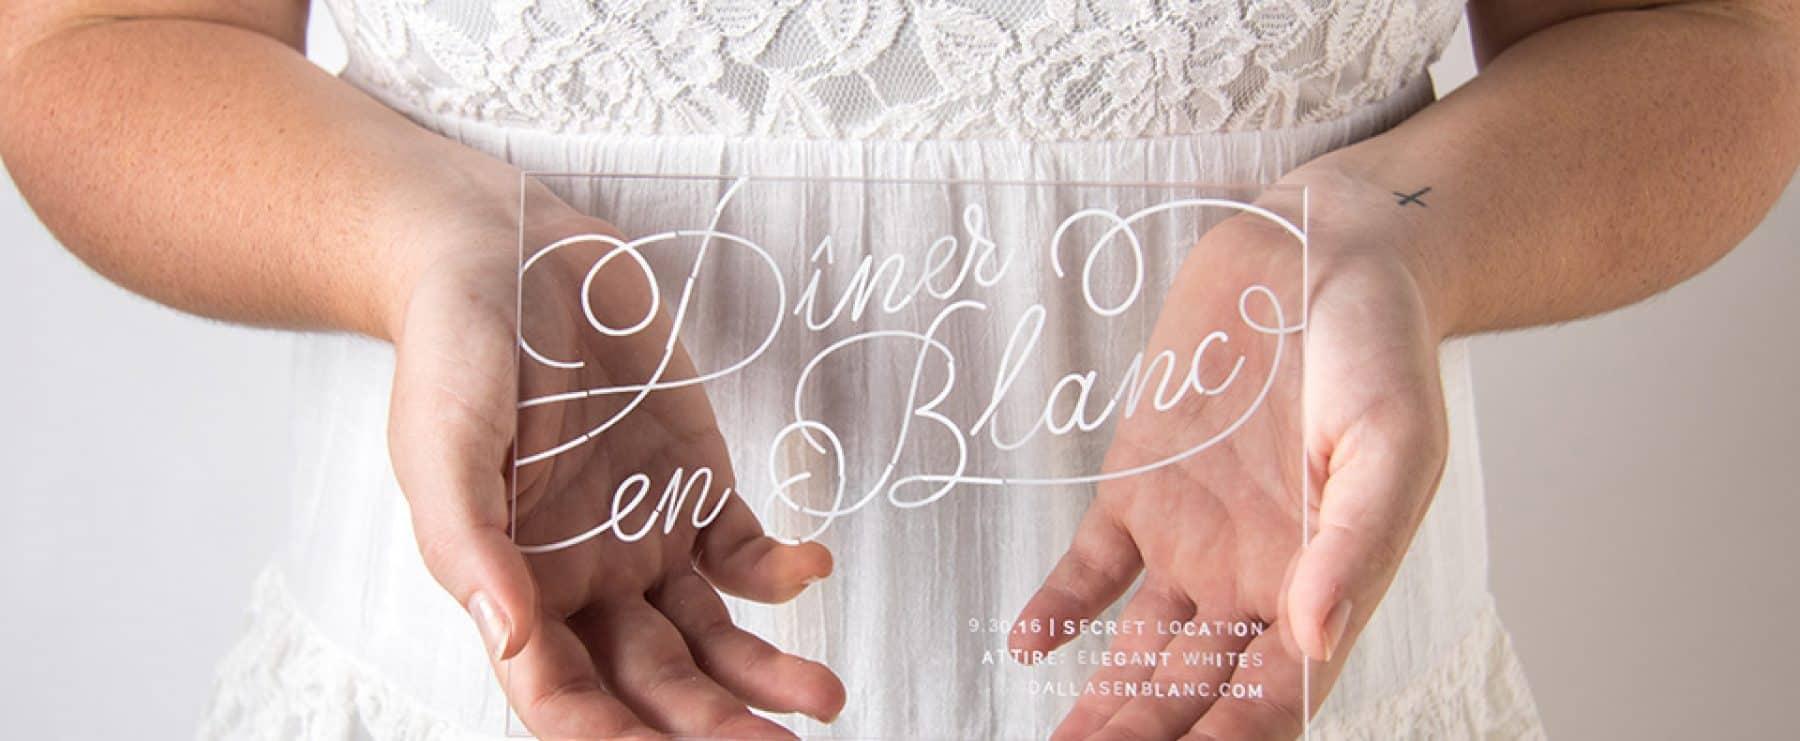 diner_en_blanc_graphis